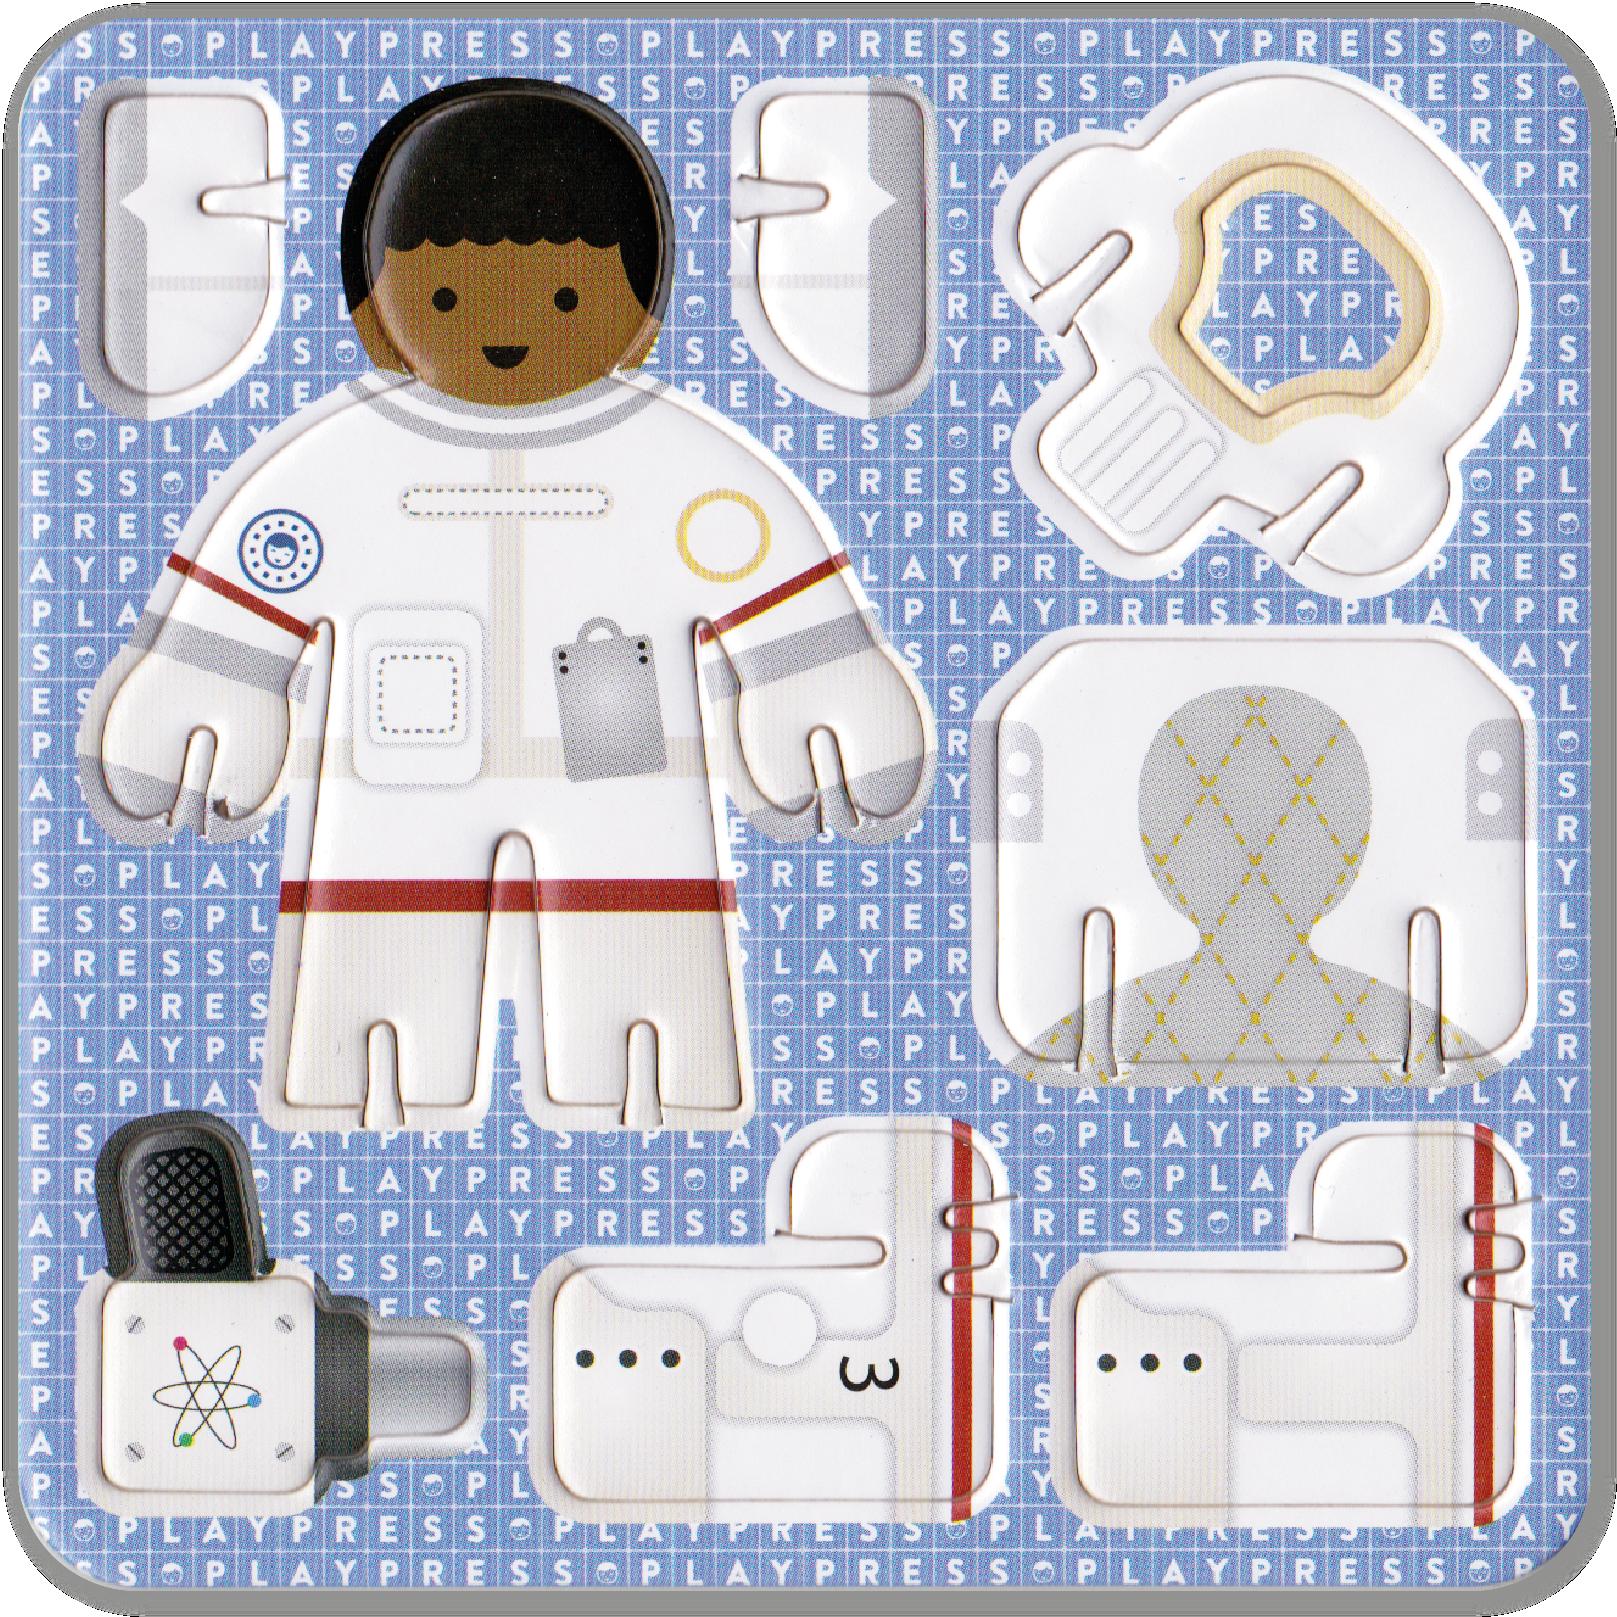 Design Workings_Playpress Astronuat Playboard Sheet.png